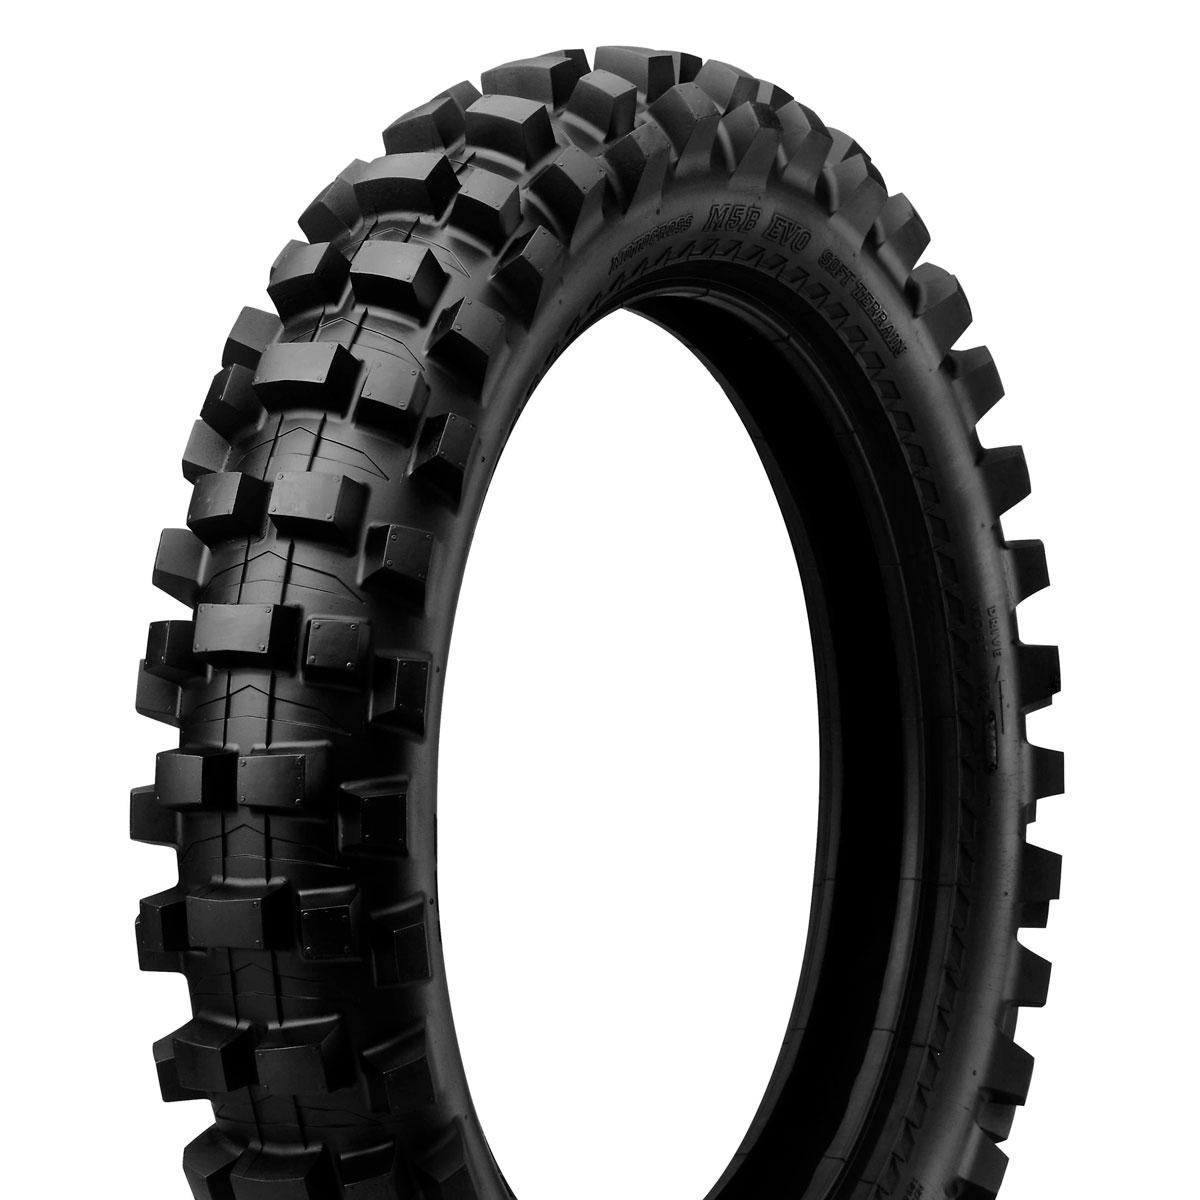 IRC M5B Evo 100/90-19 Front Tire